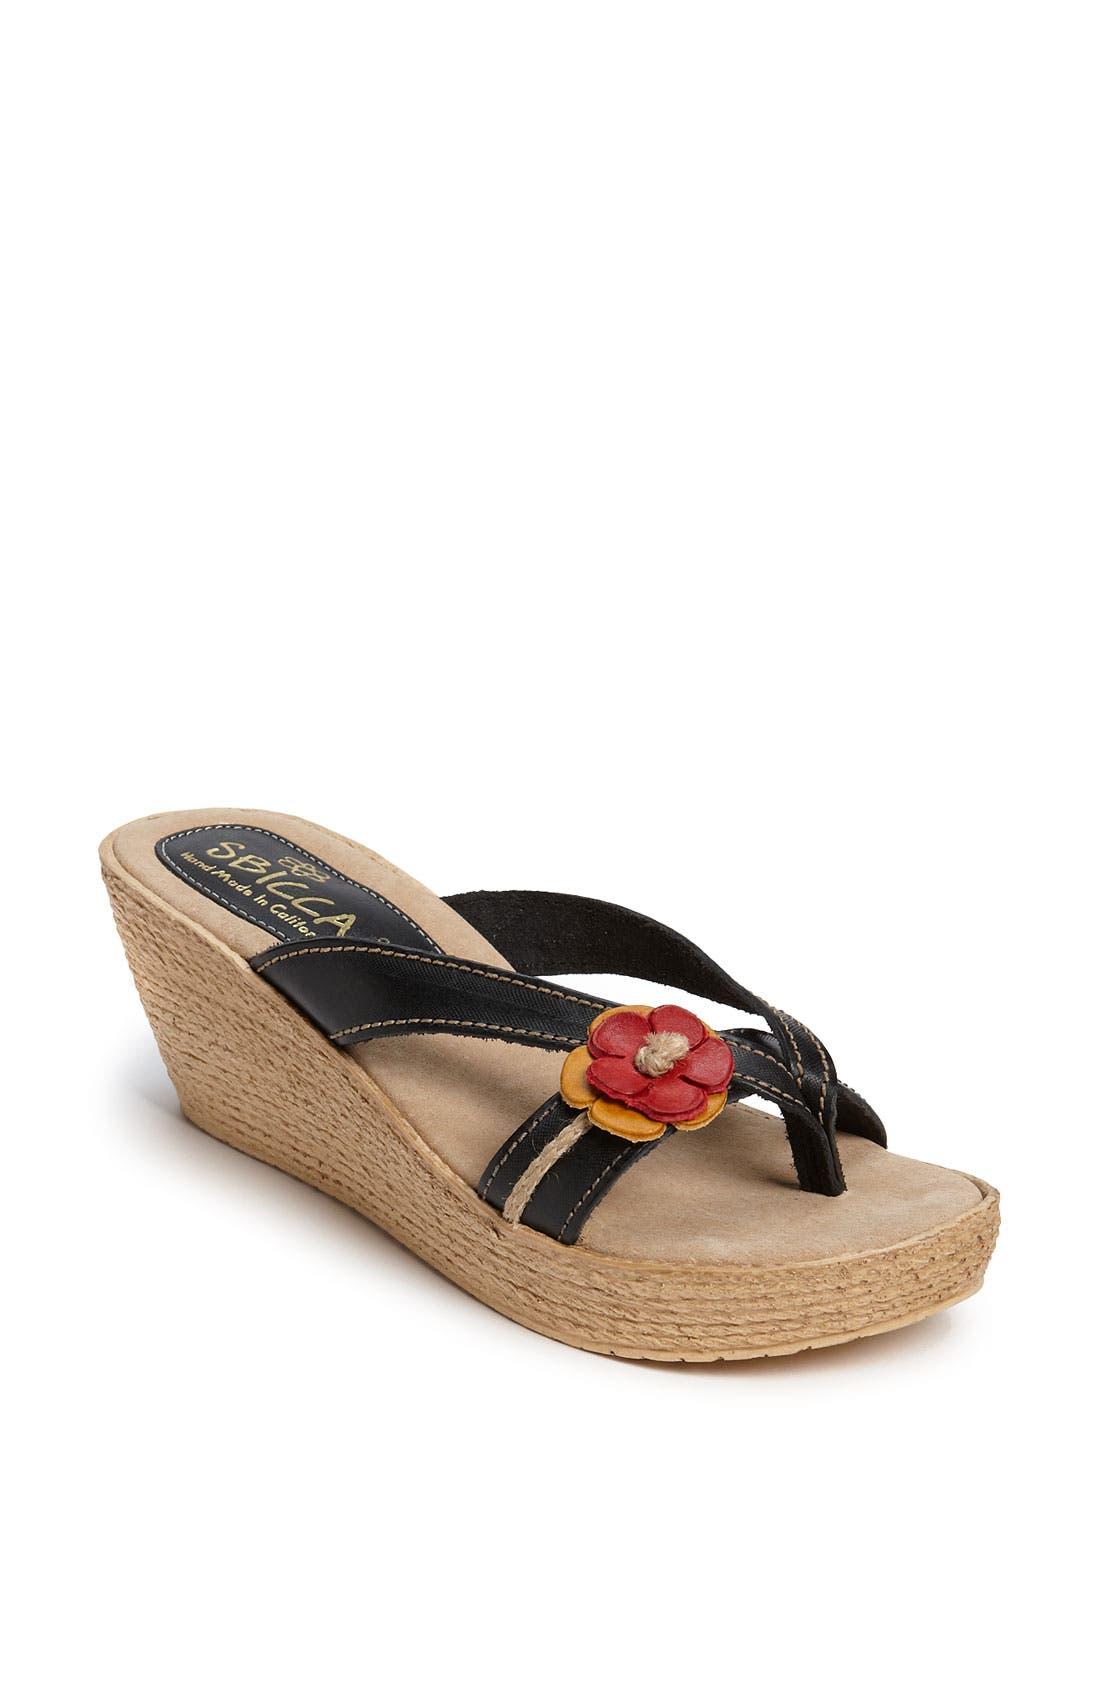 Main Image - Sbicca 'Amity' Sandal